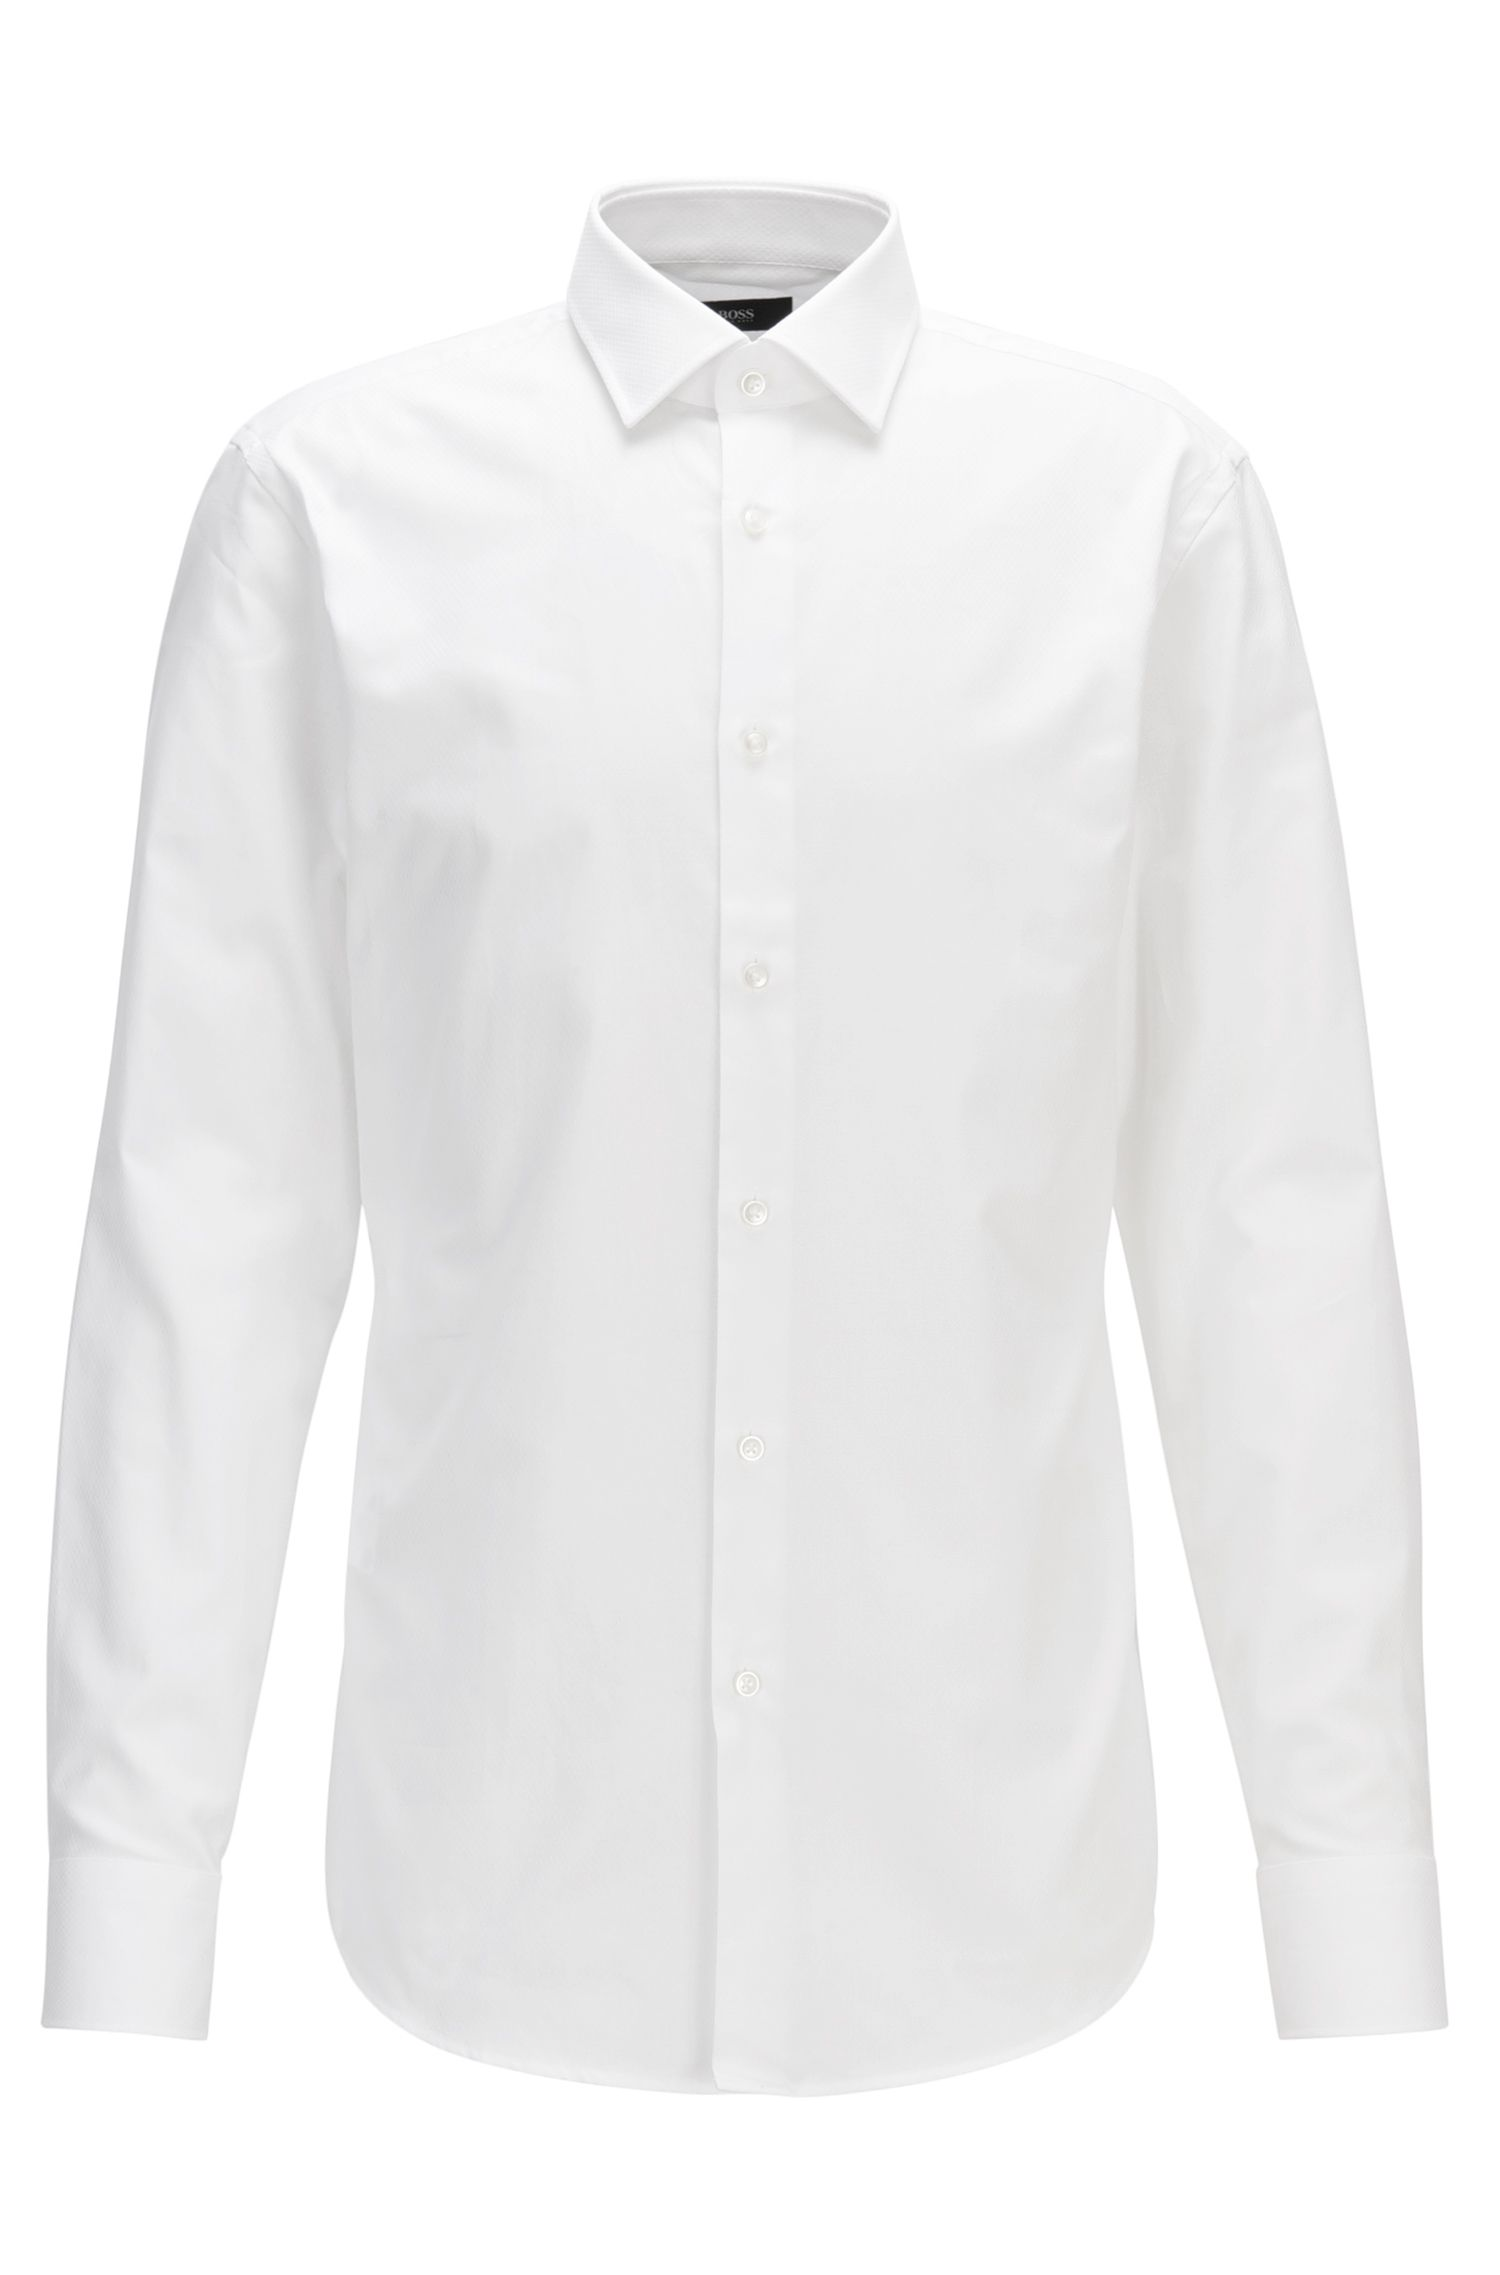 Cotton Dress Shirt, Slim Fit | Jenno